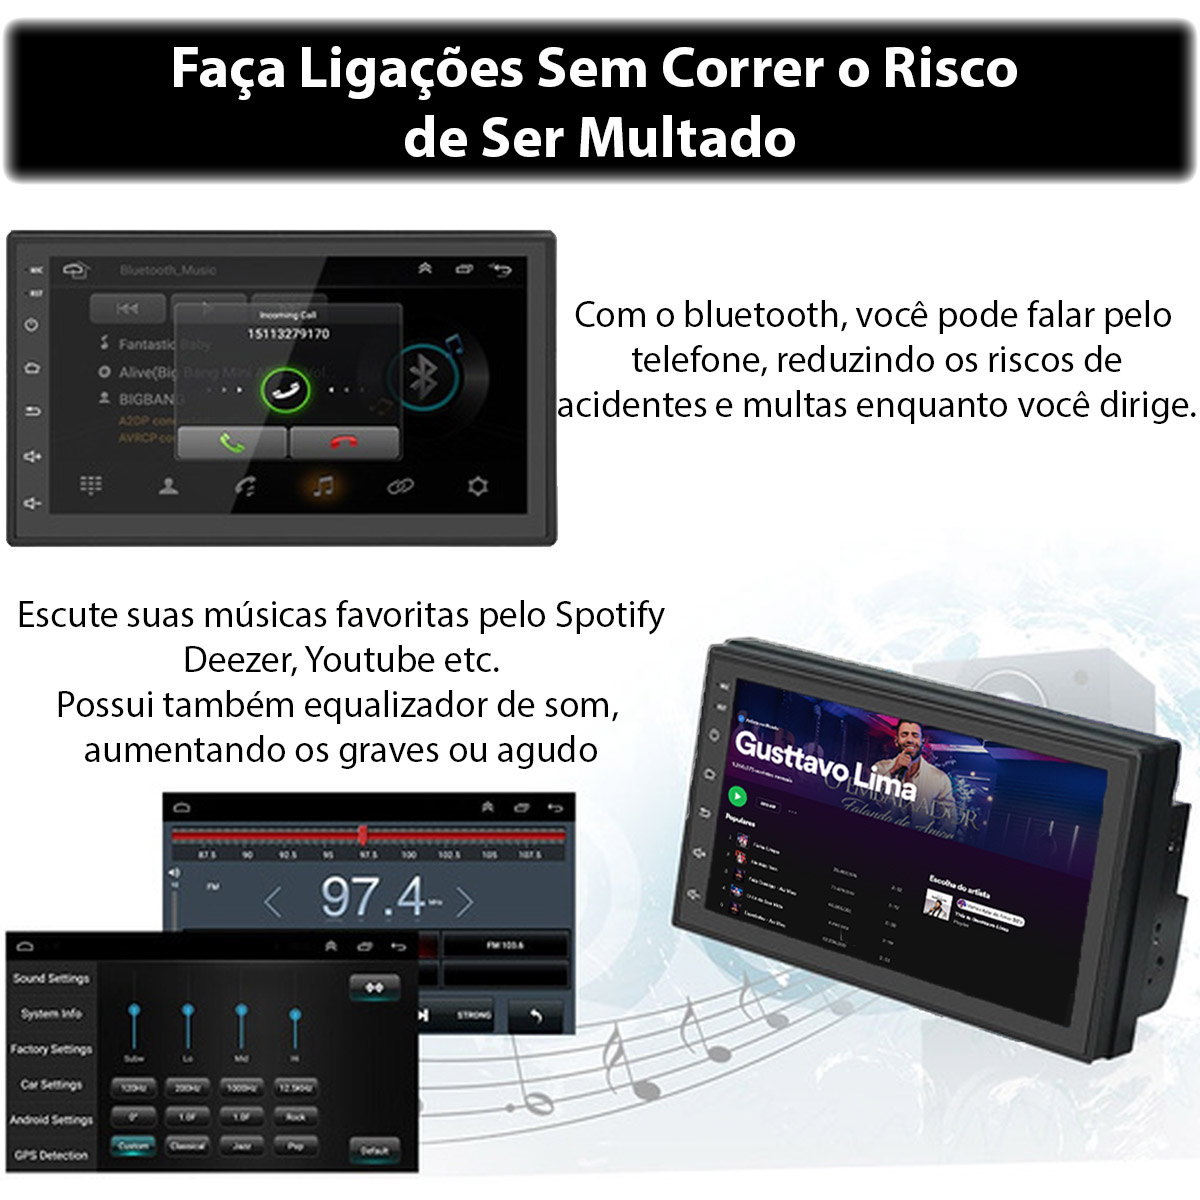 Central Multimidia com Moldura Nissan Versa Mp5 Bluetooth Usb Touchscreen 7 Polegadas 2 Din Black Piano 2021 Atacado